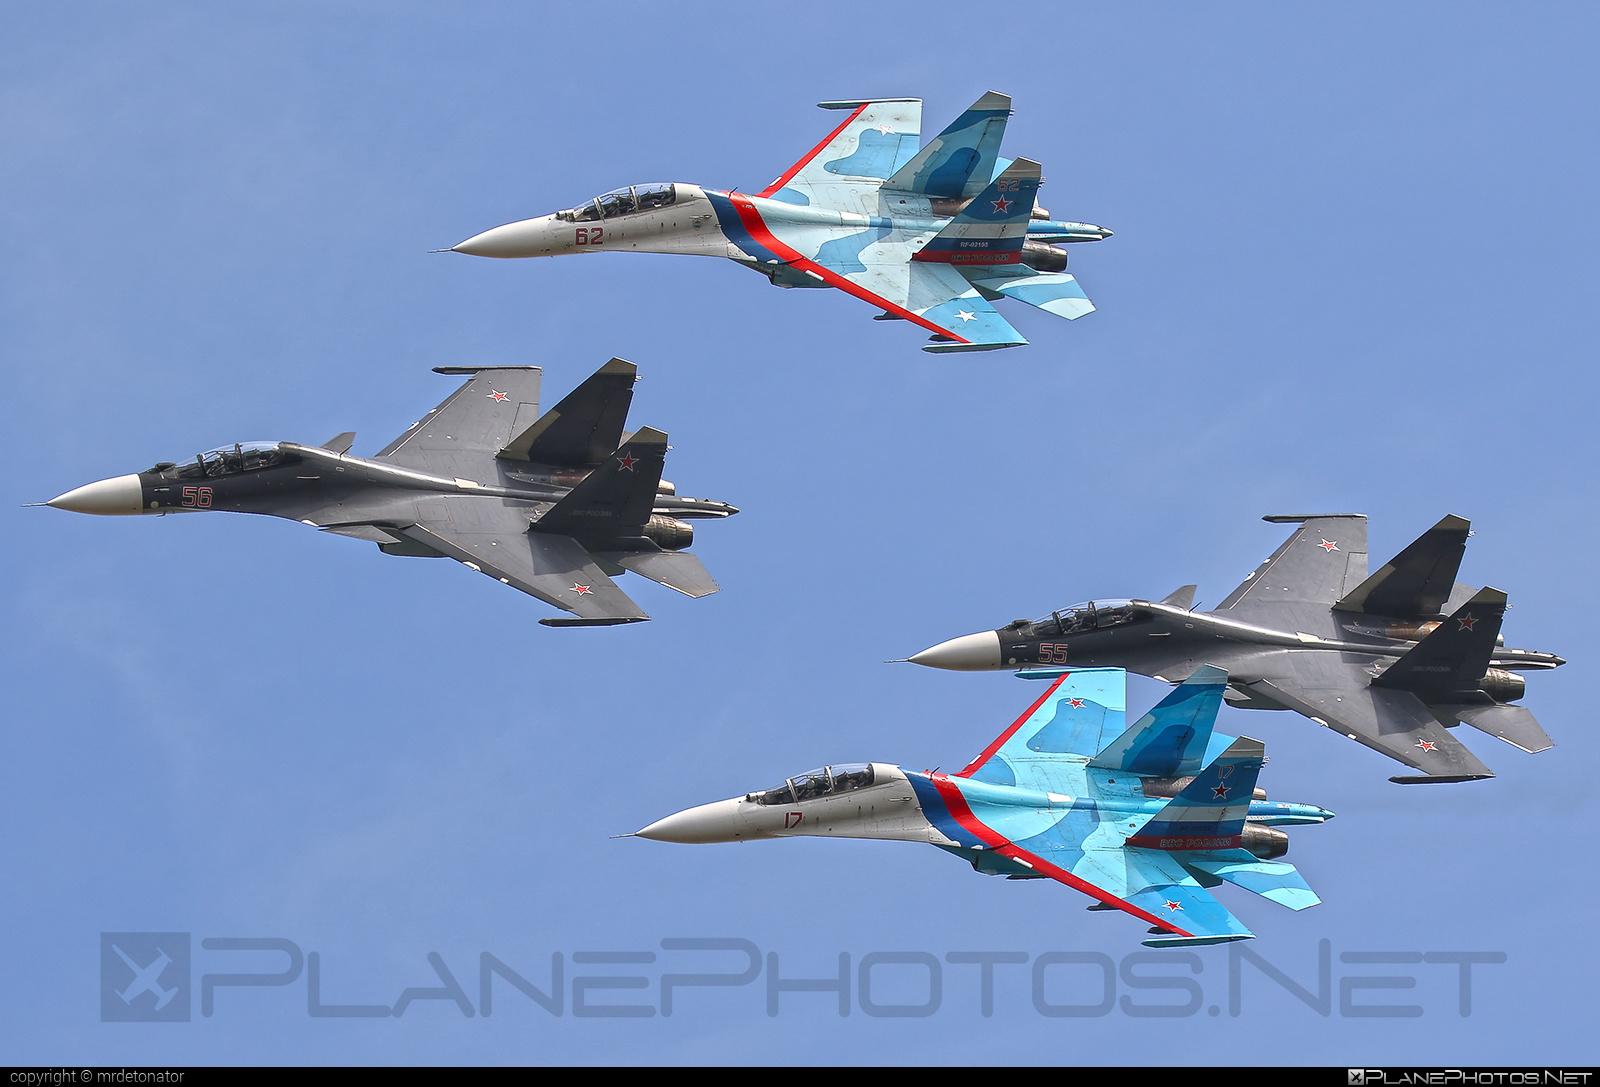 Sukhoi Su-30SM - 56 operated by Voyenno-vozdushnye sily Rossii (Russian Air Force) #maks2015 #sukhoi